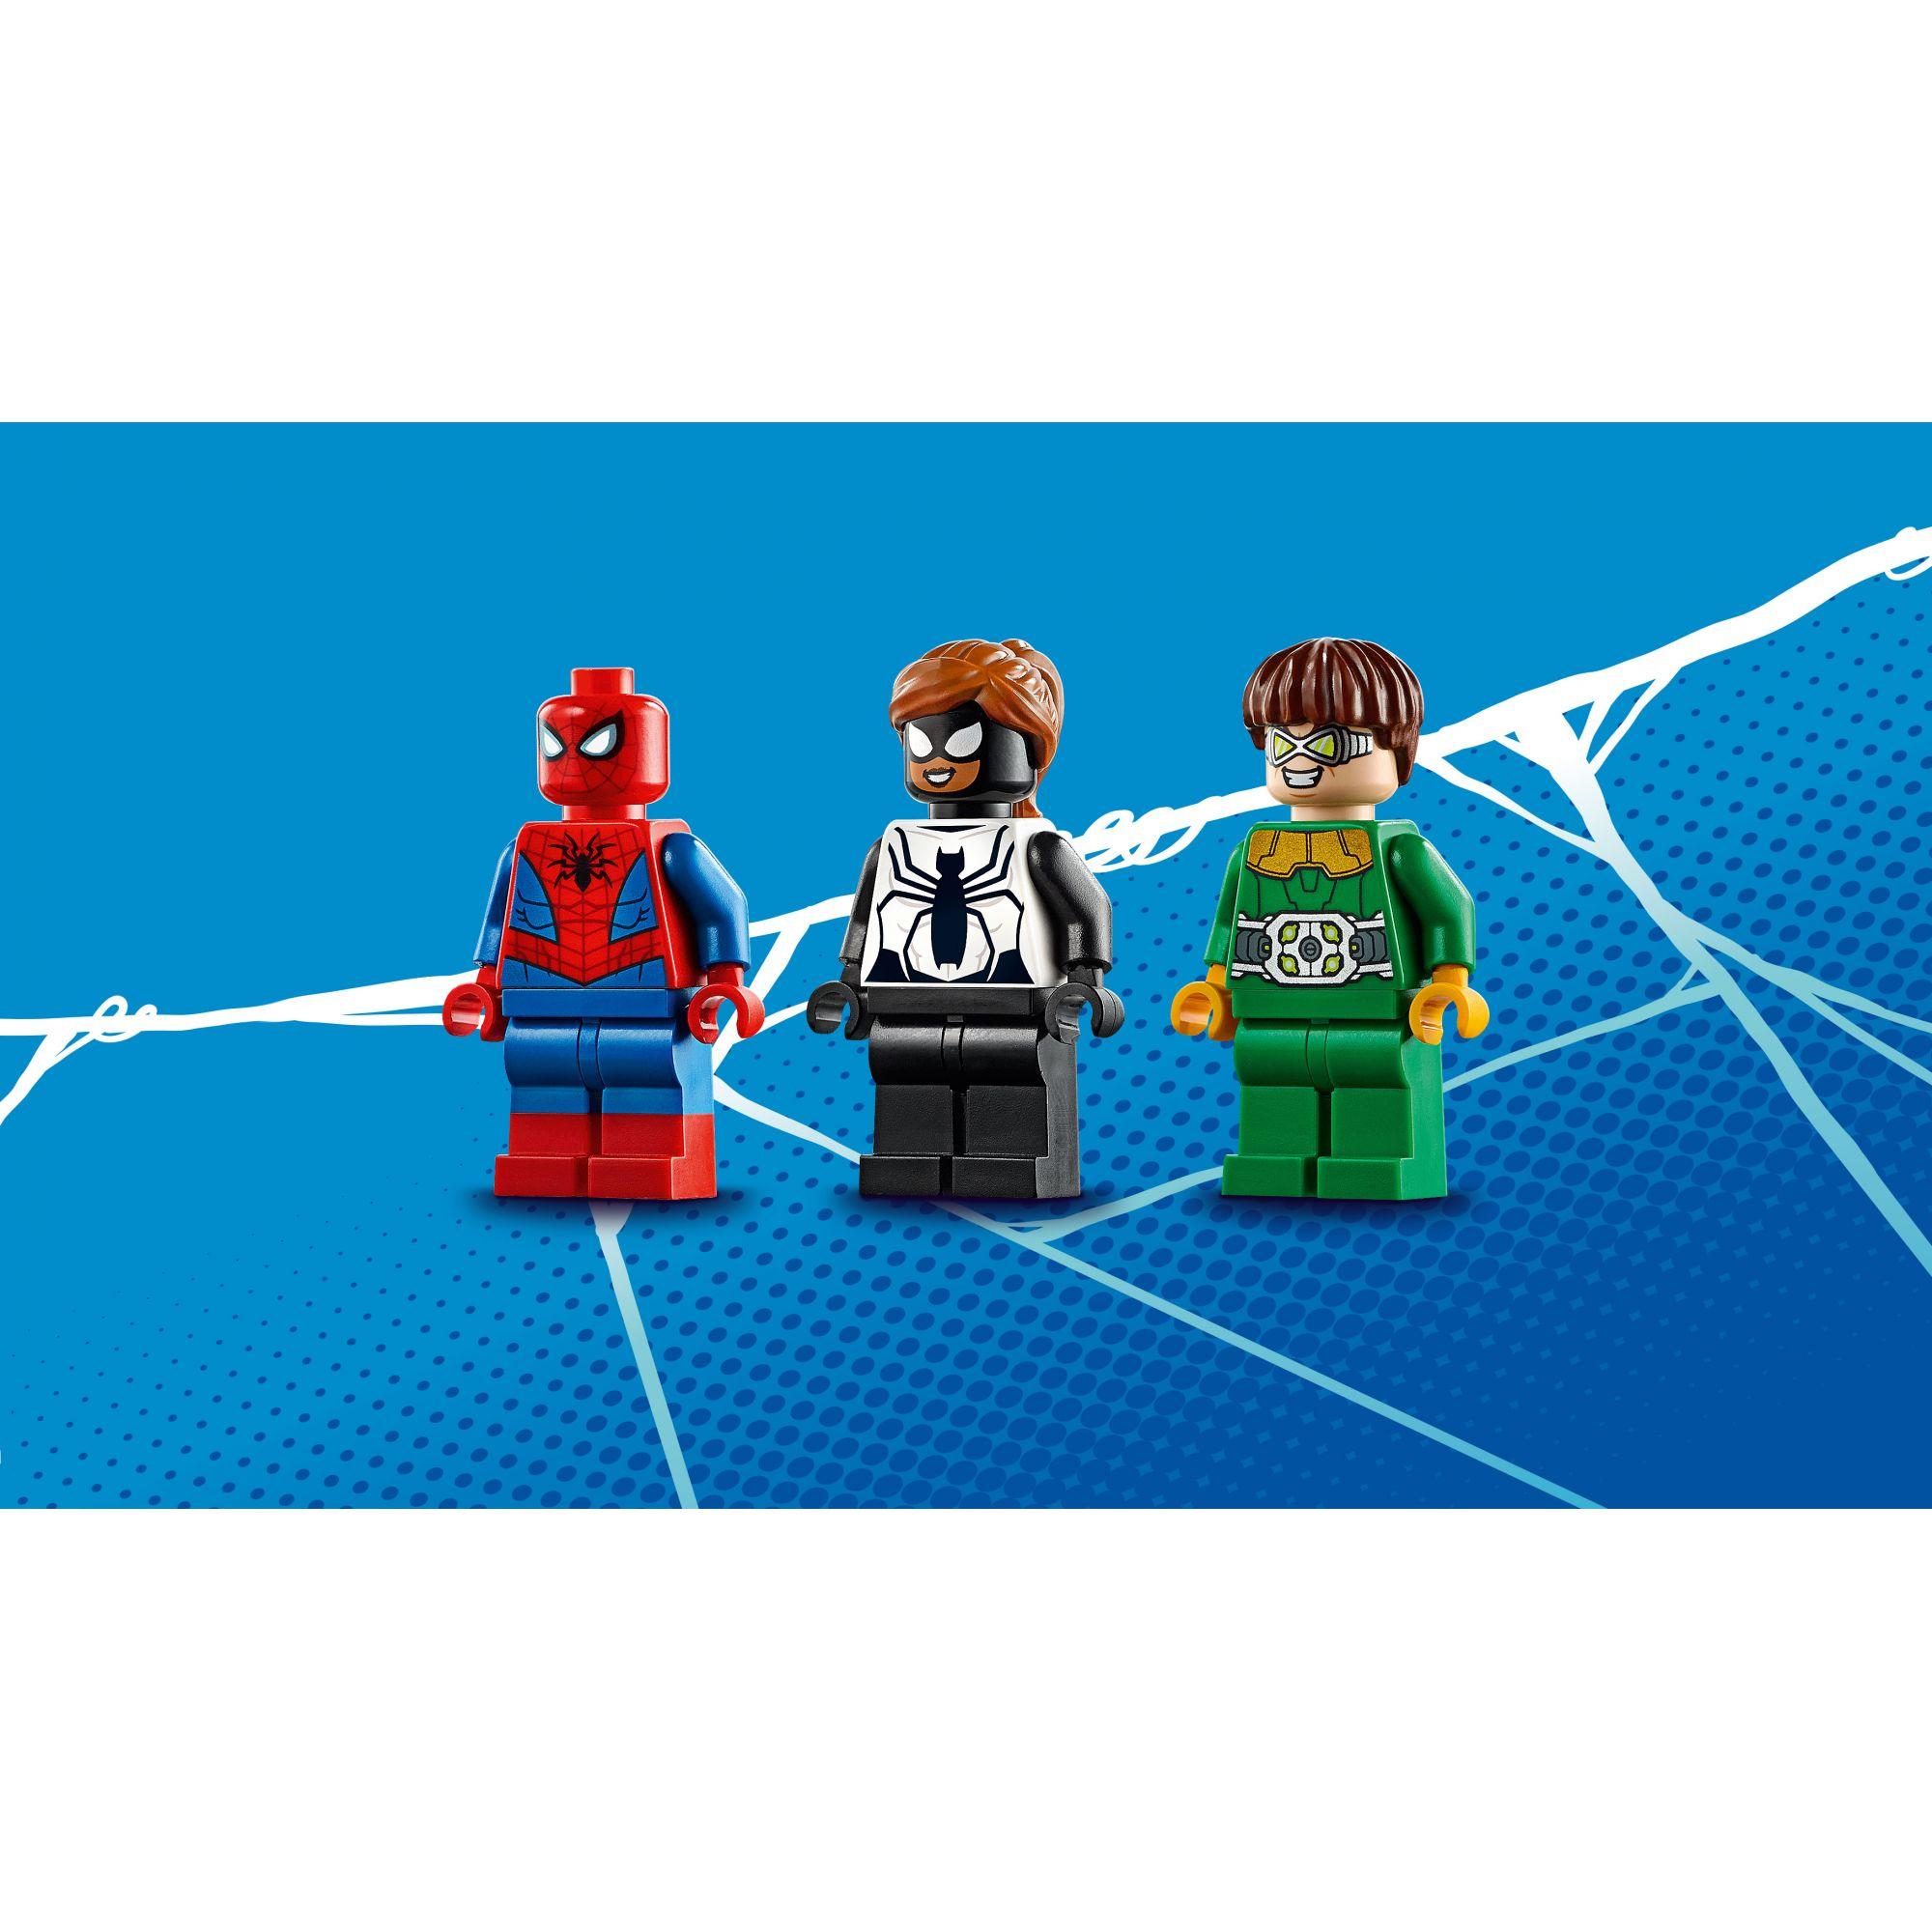 LEGO Marvel Super Heroes Spider-Man vs. Doc Ock - 76148